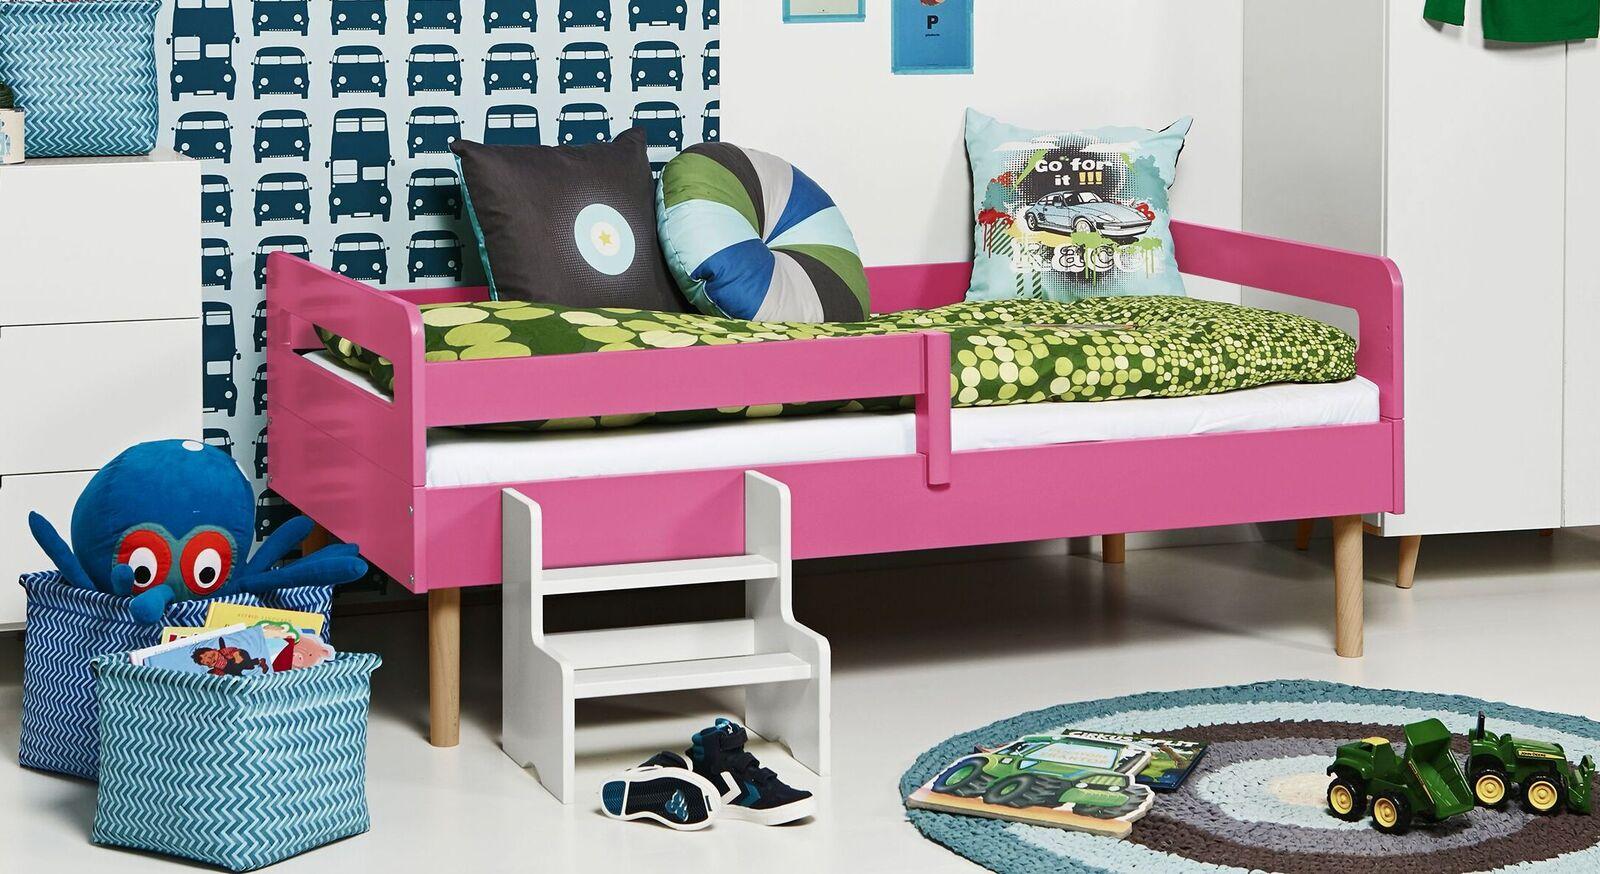 Modernes Kinderbett Kids Town Retro aus pinkem MDF